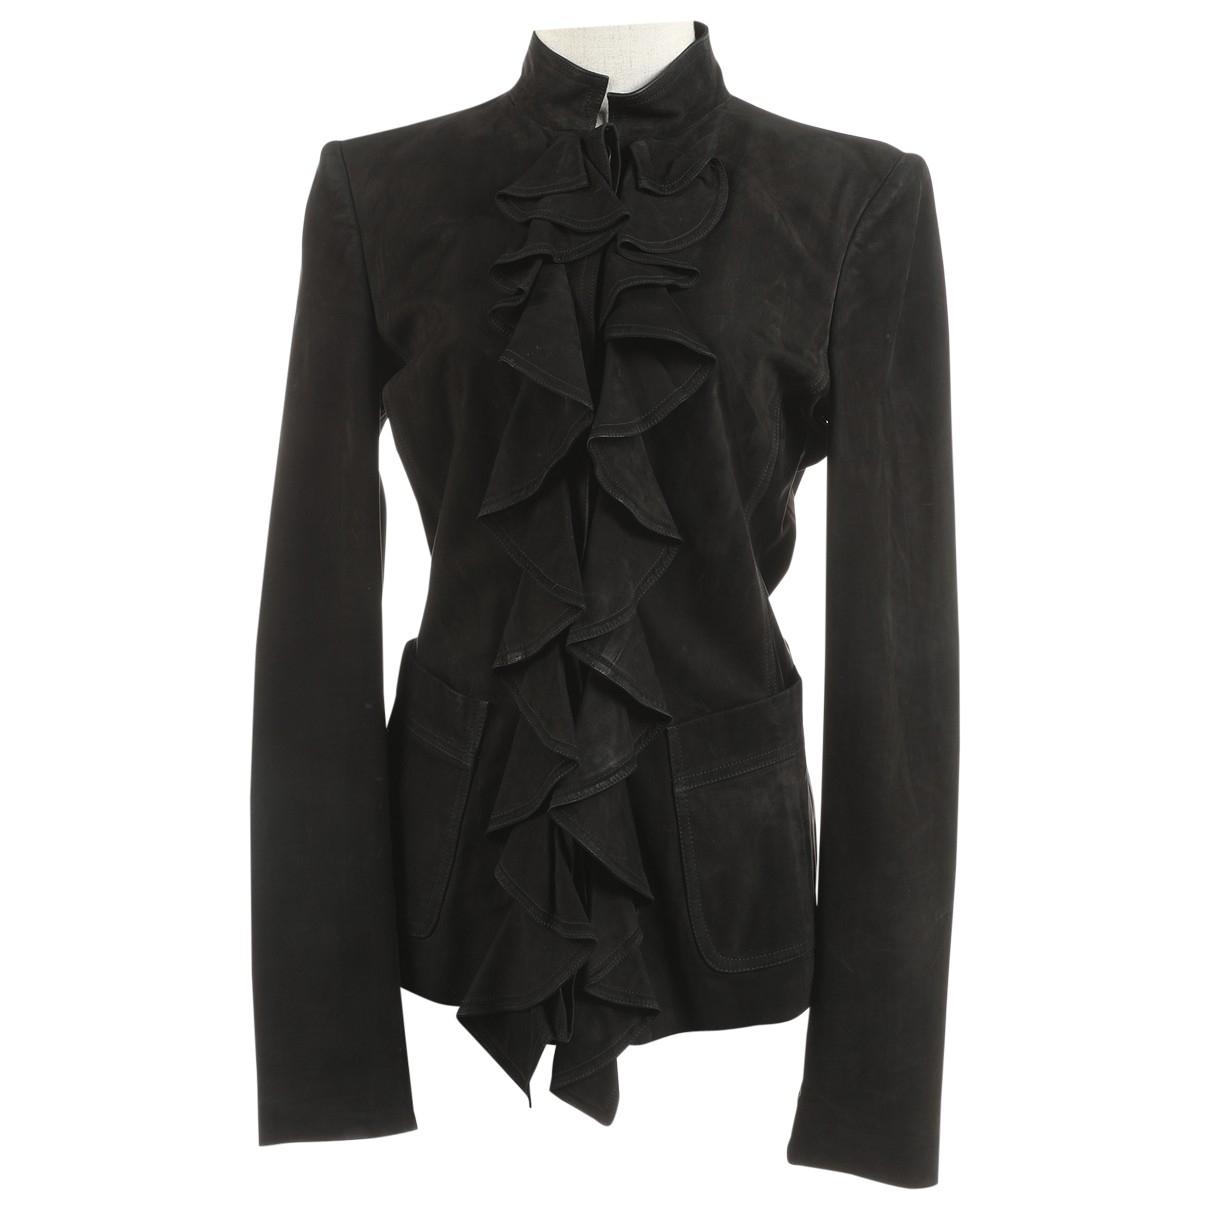 Yves Saint Laurent \N Black Leather jacket for Women 36 IT